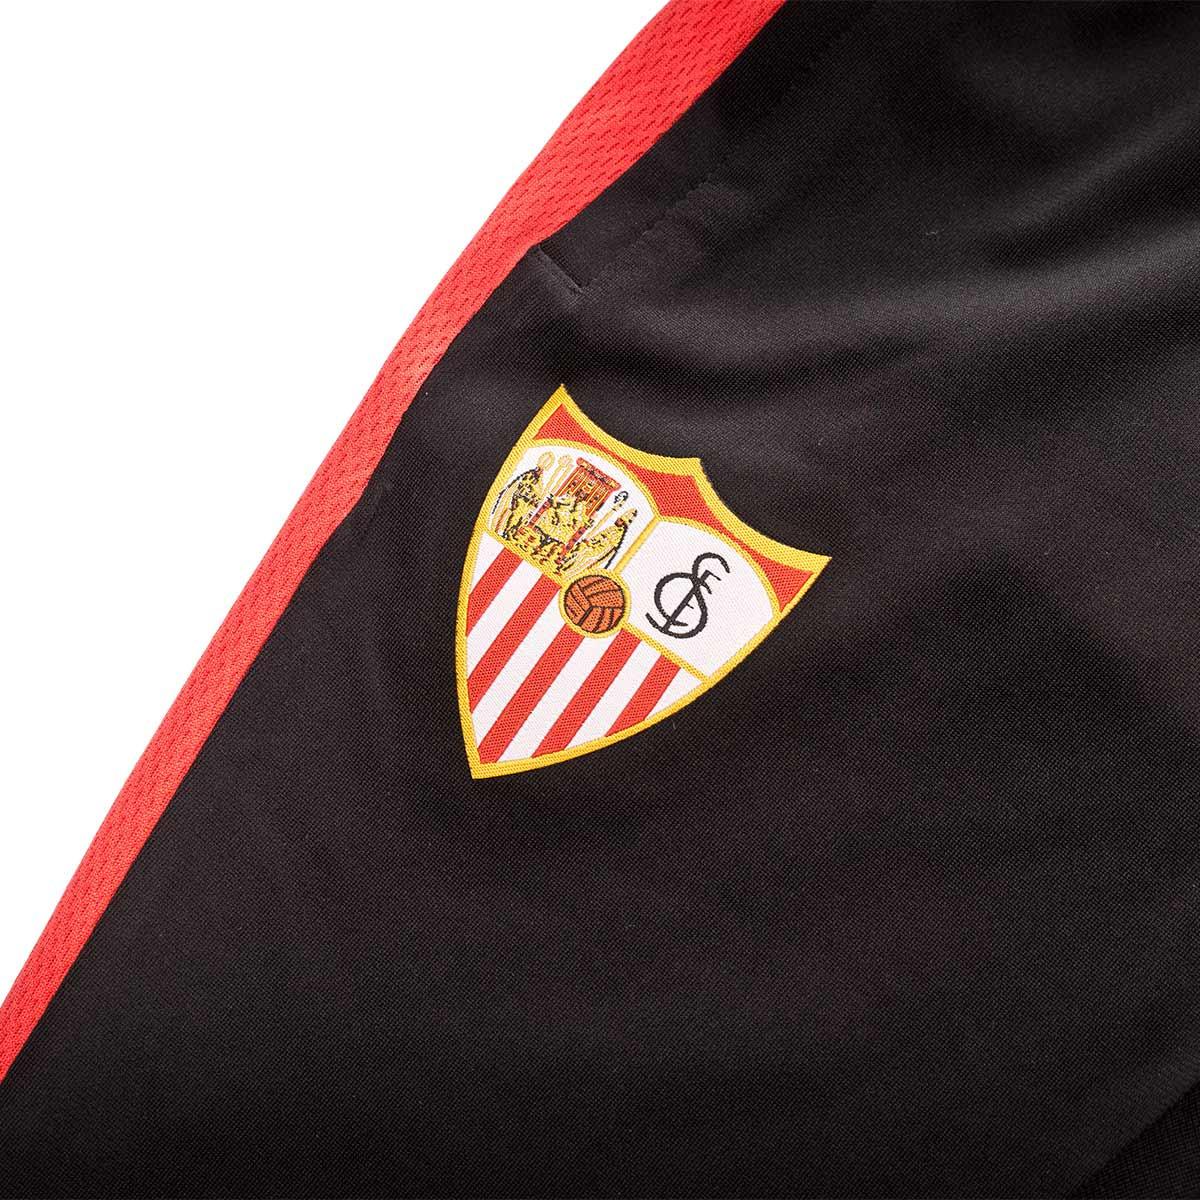 Pantalon Largo Nike Chandal Sevilla Fc Paseo 2019 2020 Nino Black Futbol Emotion